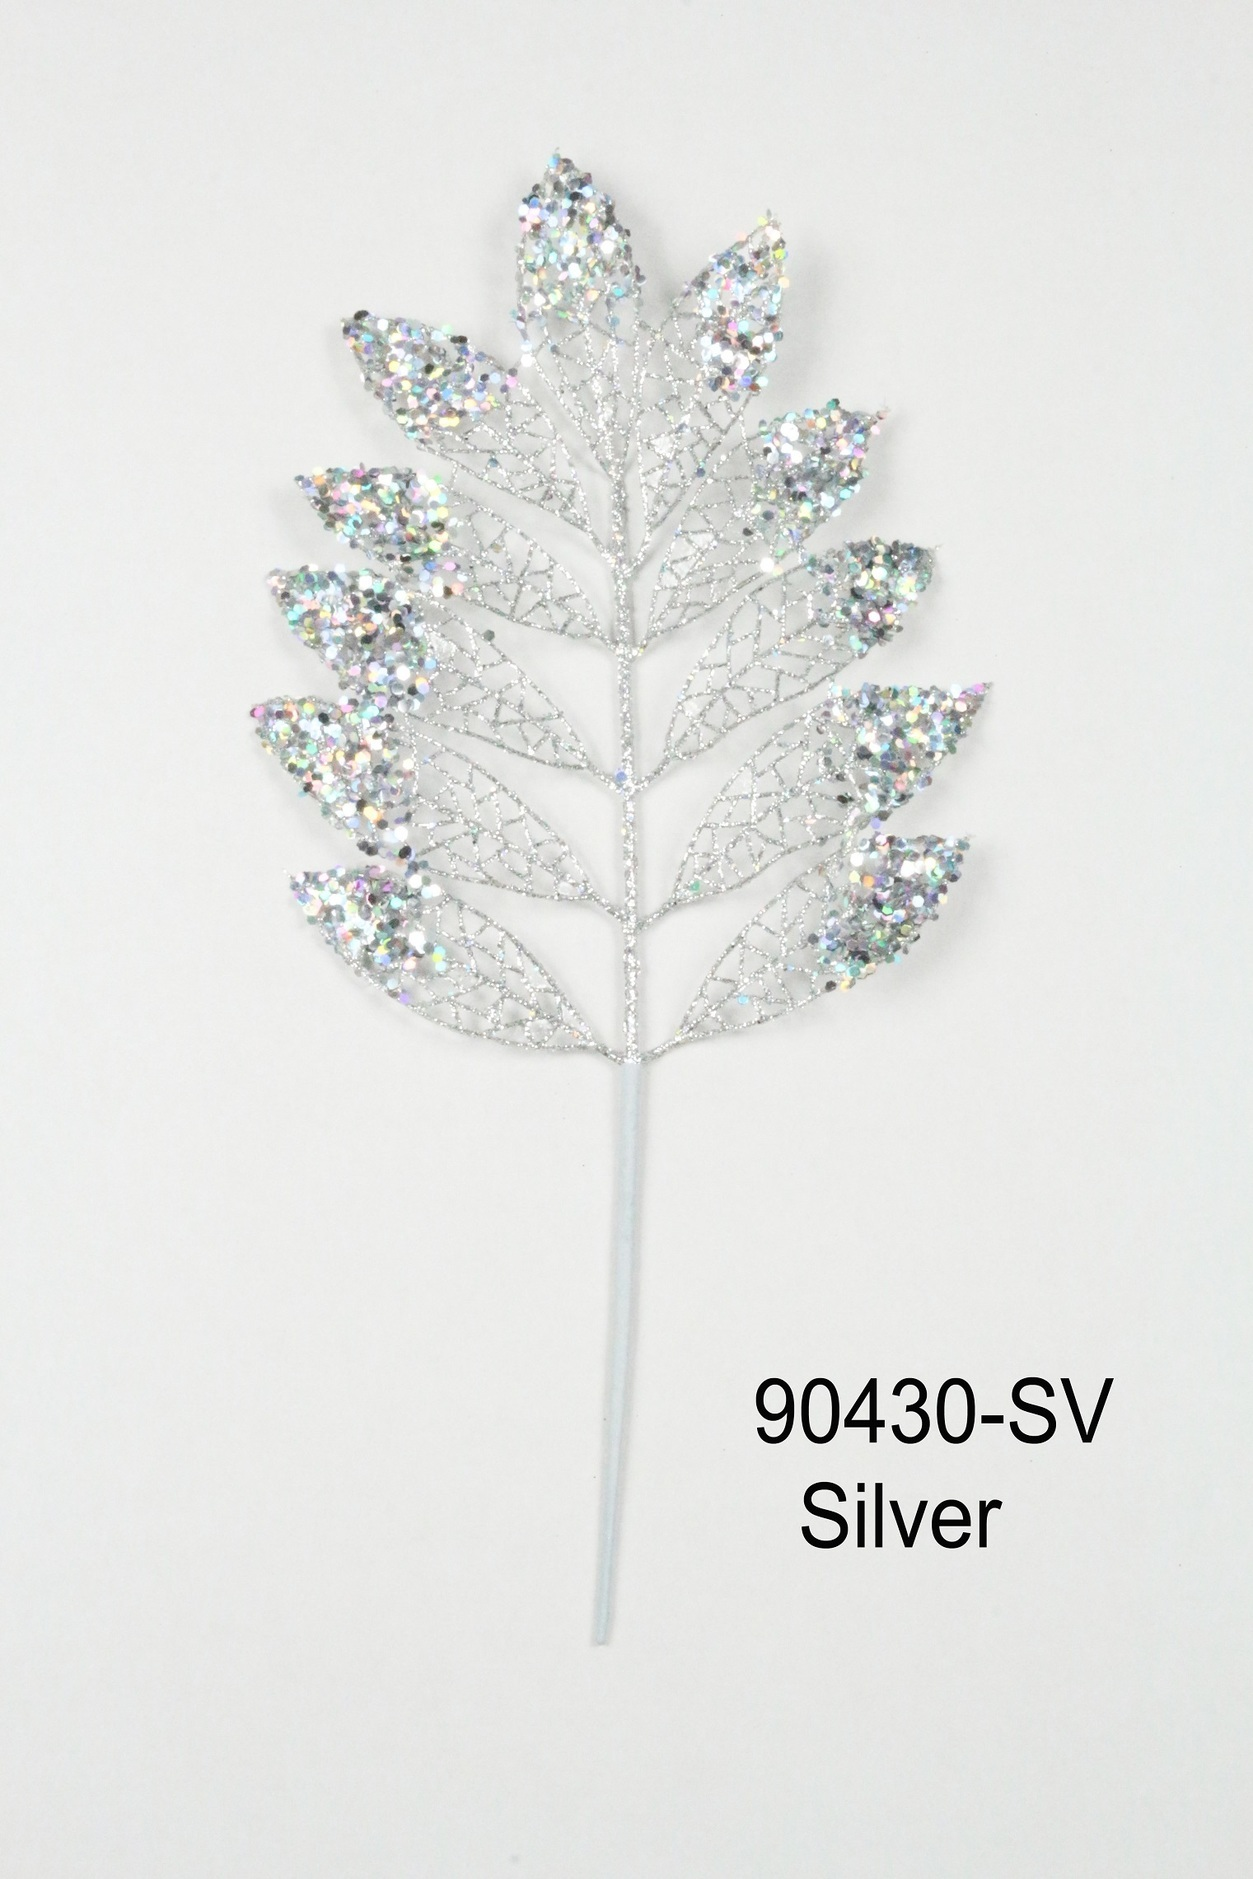 90430-SV